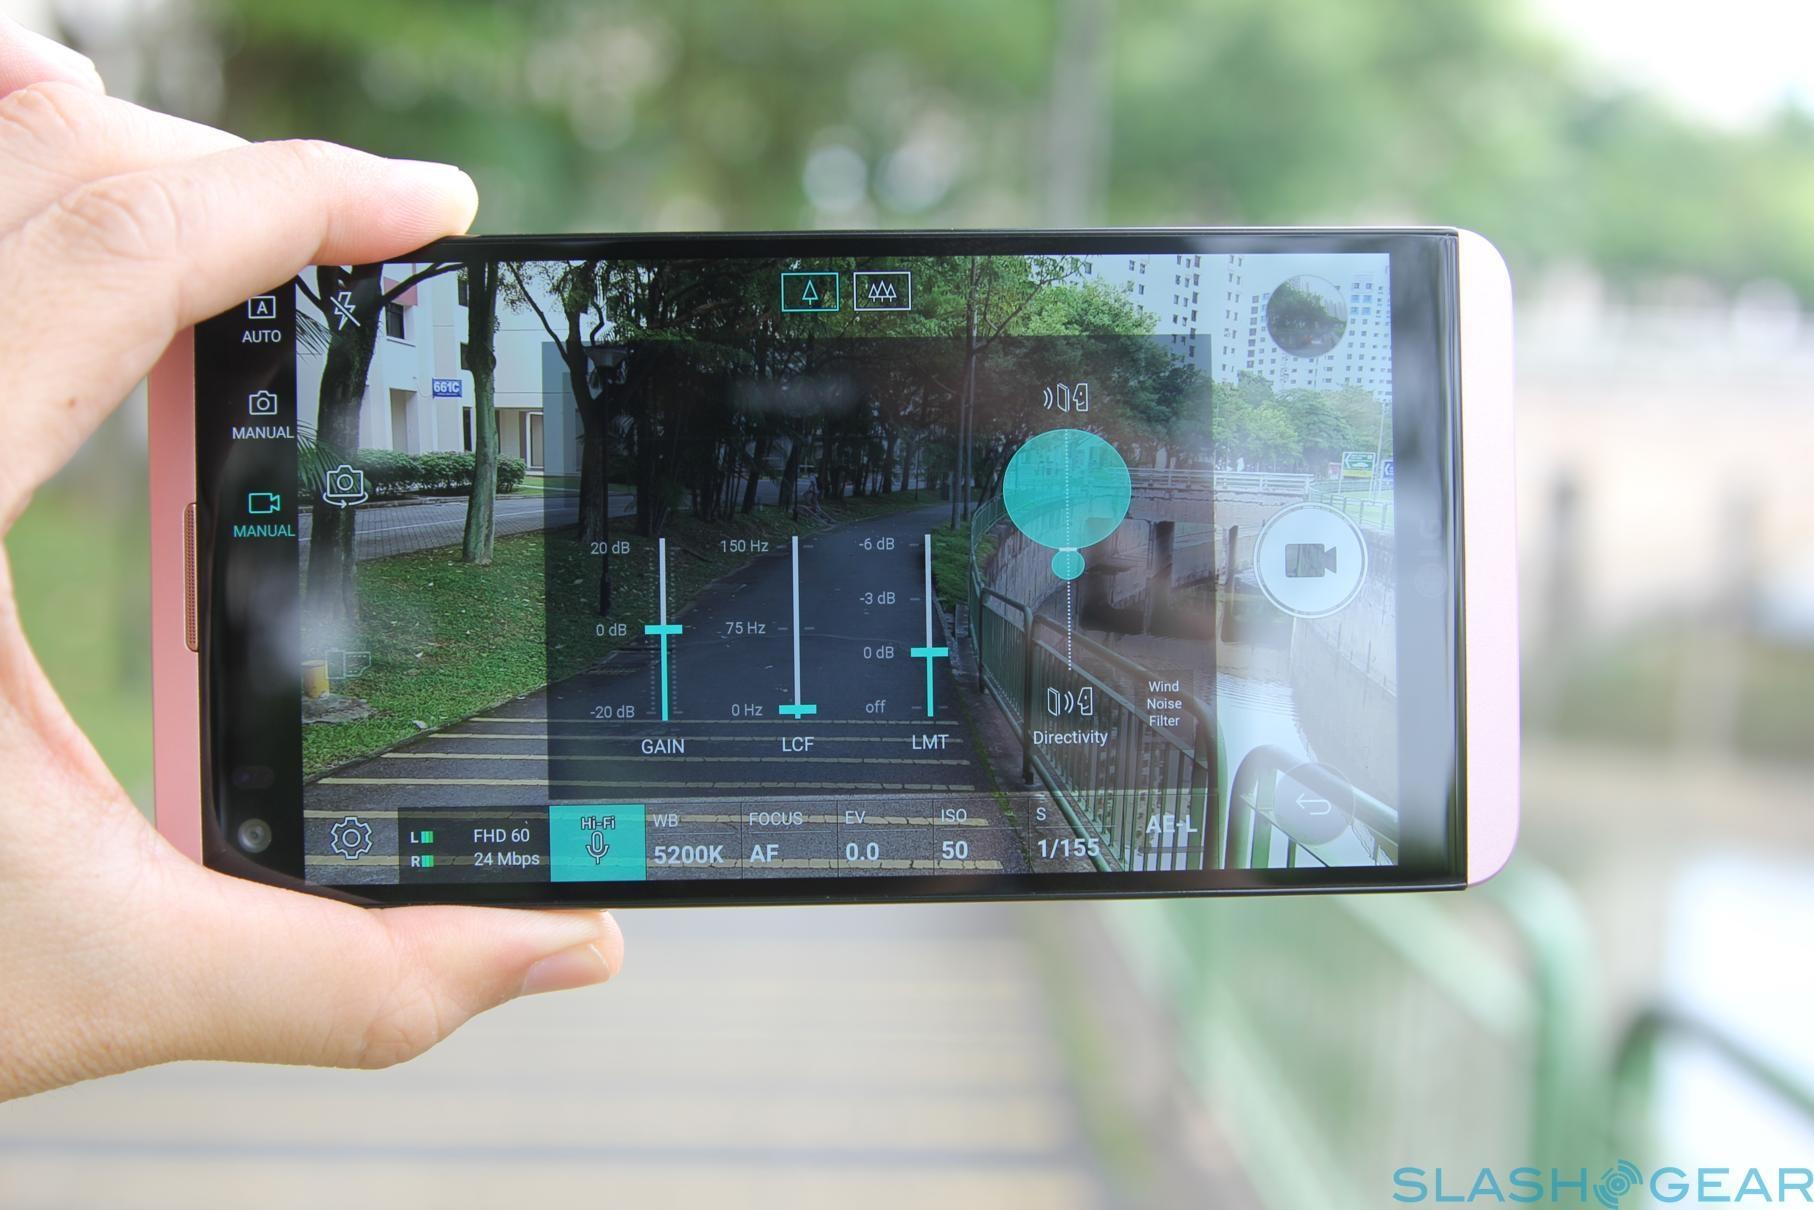 LG V20 is finally here: here's why you'll want one - SlashGear